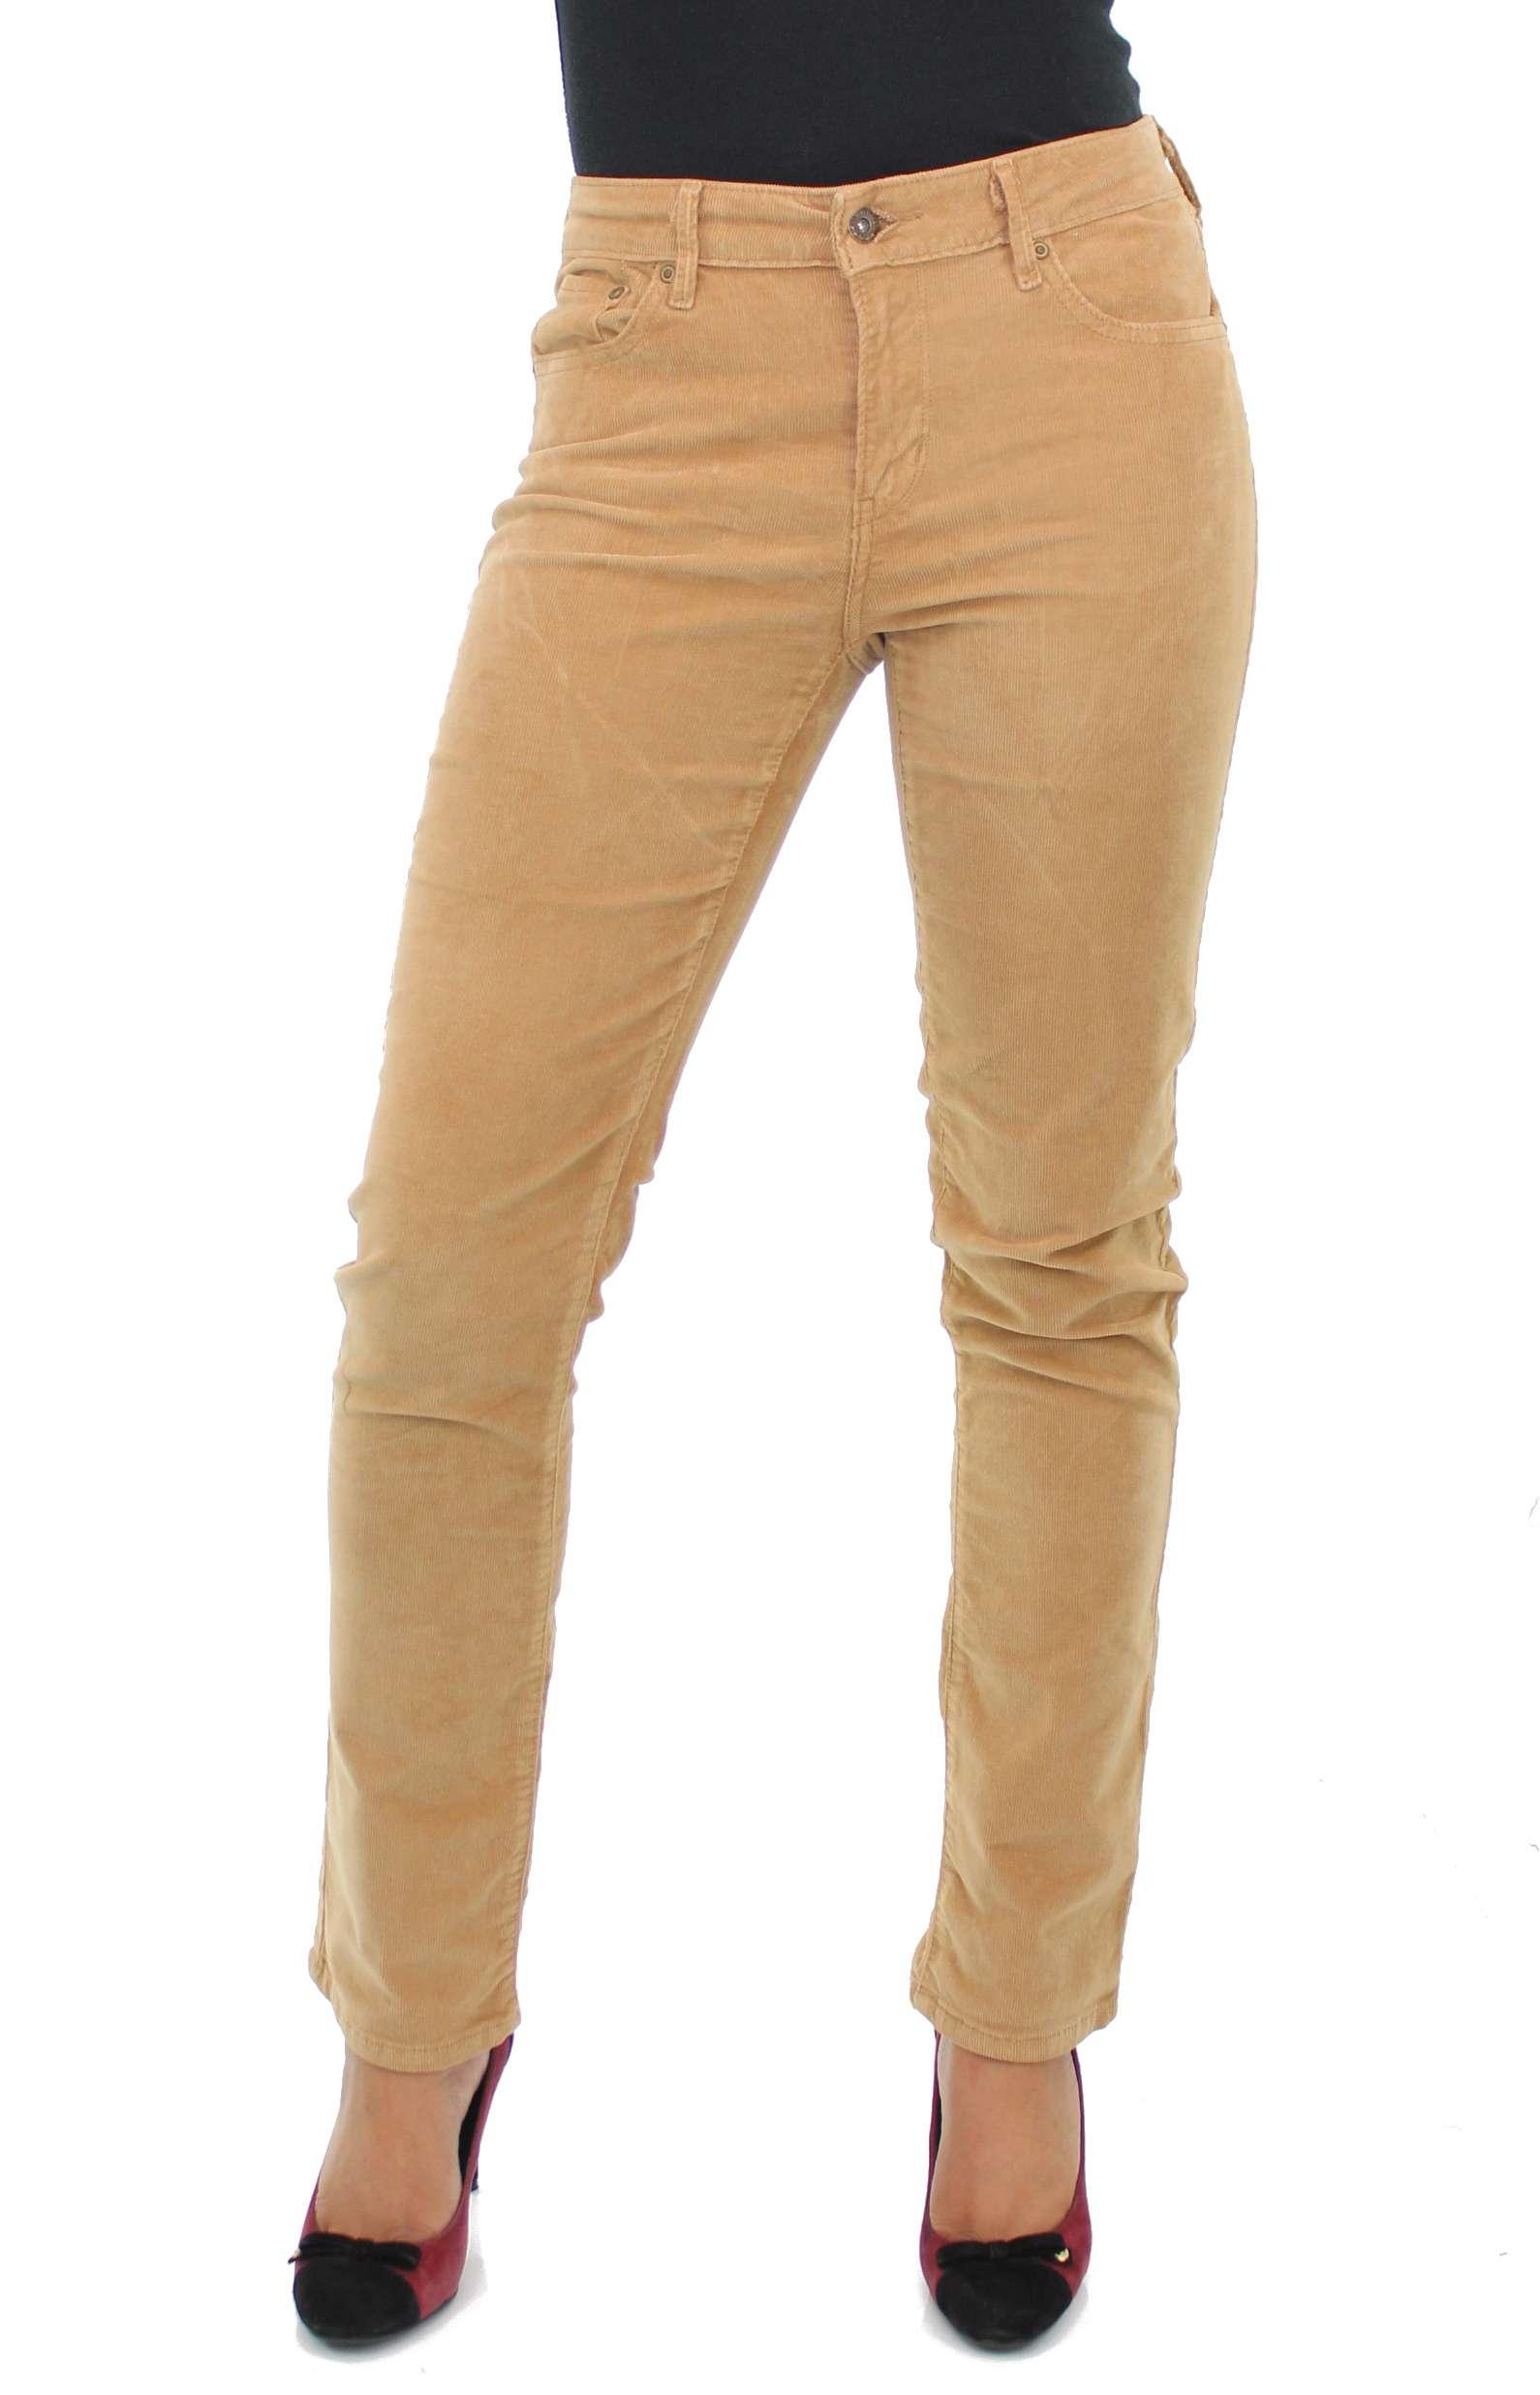 Creative Leviu0026#39;s 8403 Womens 515 Brown Mid-rise Corduroy Pants Petites 10p BHFO | EBay